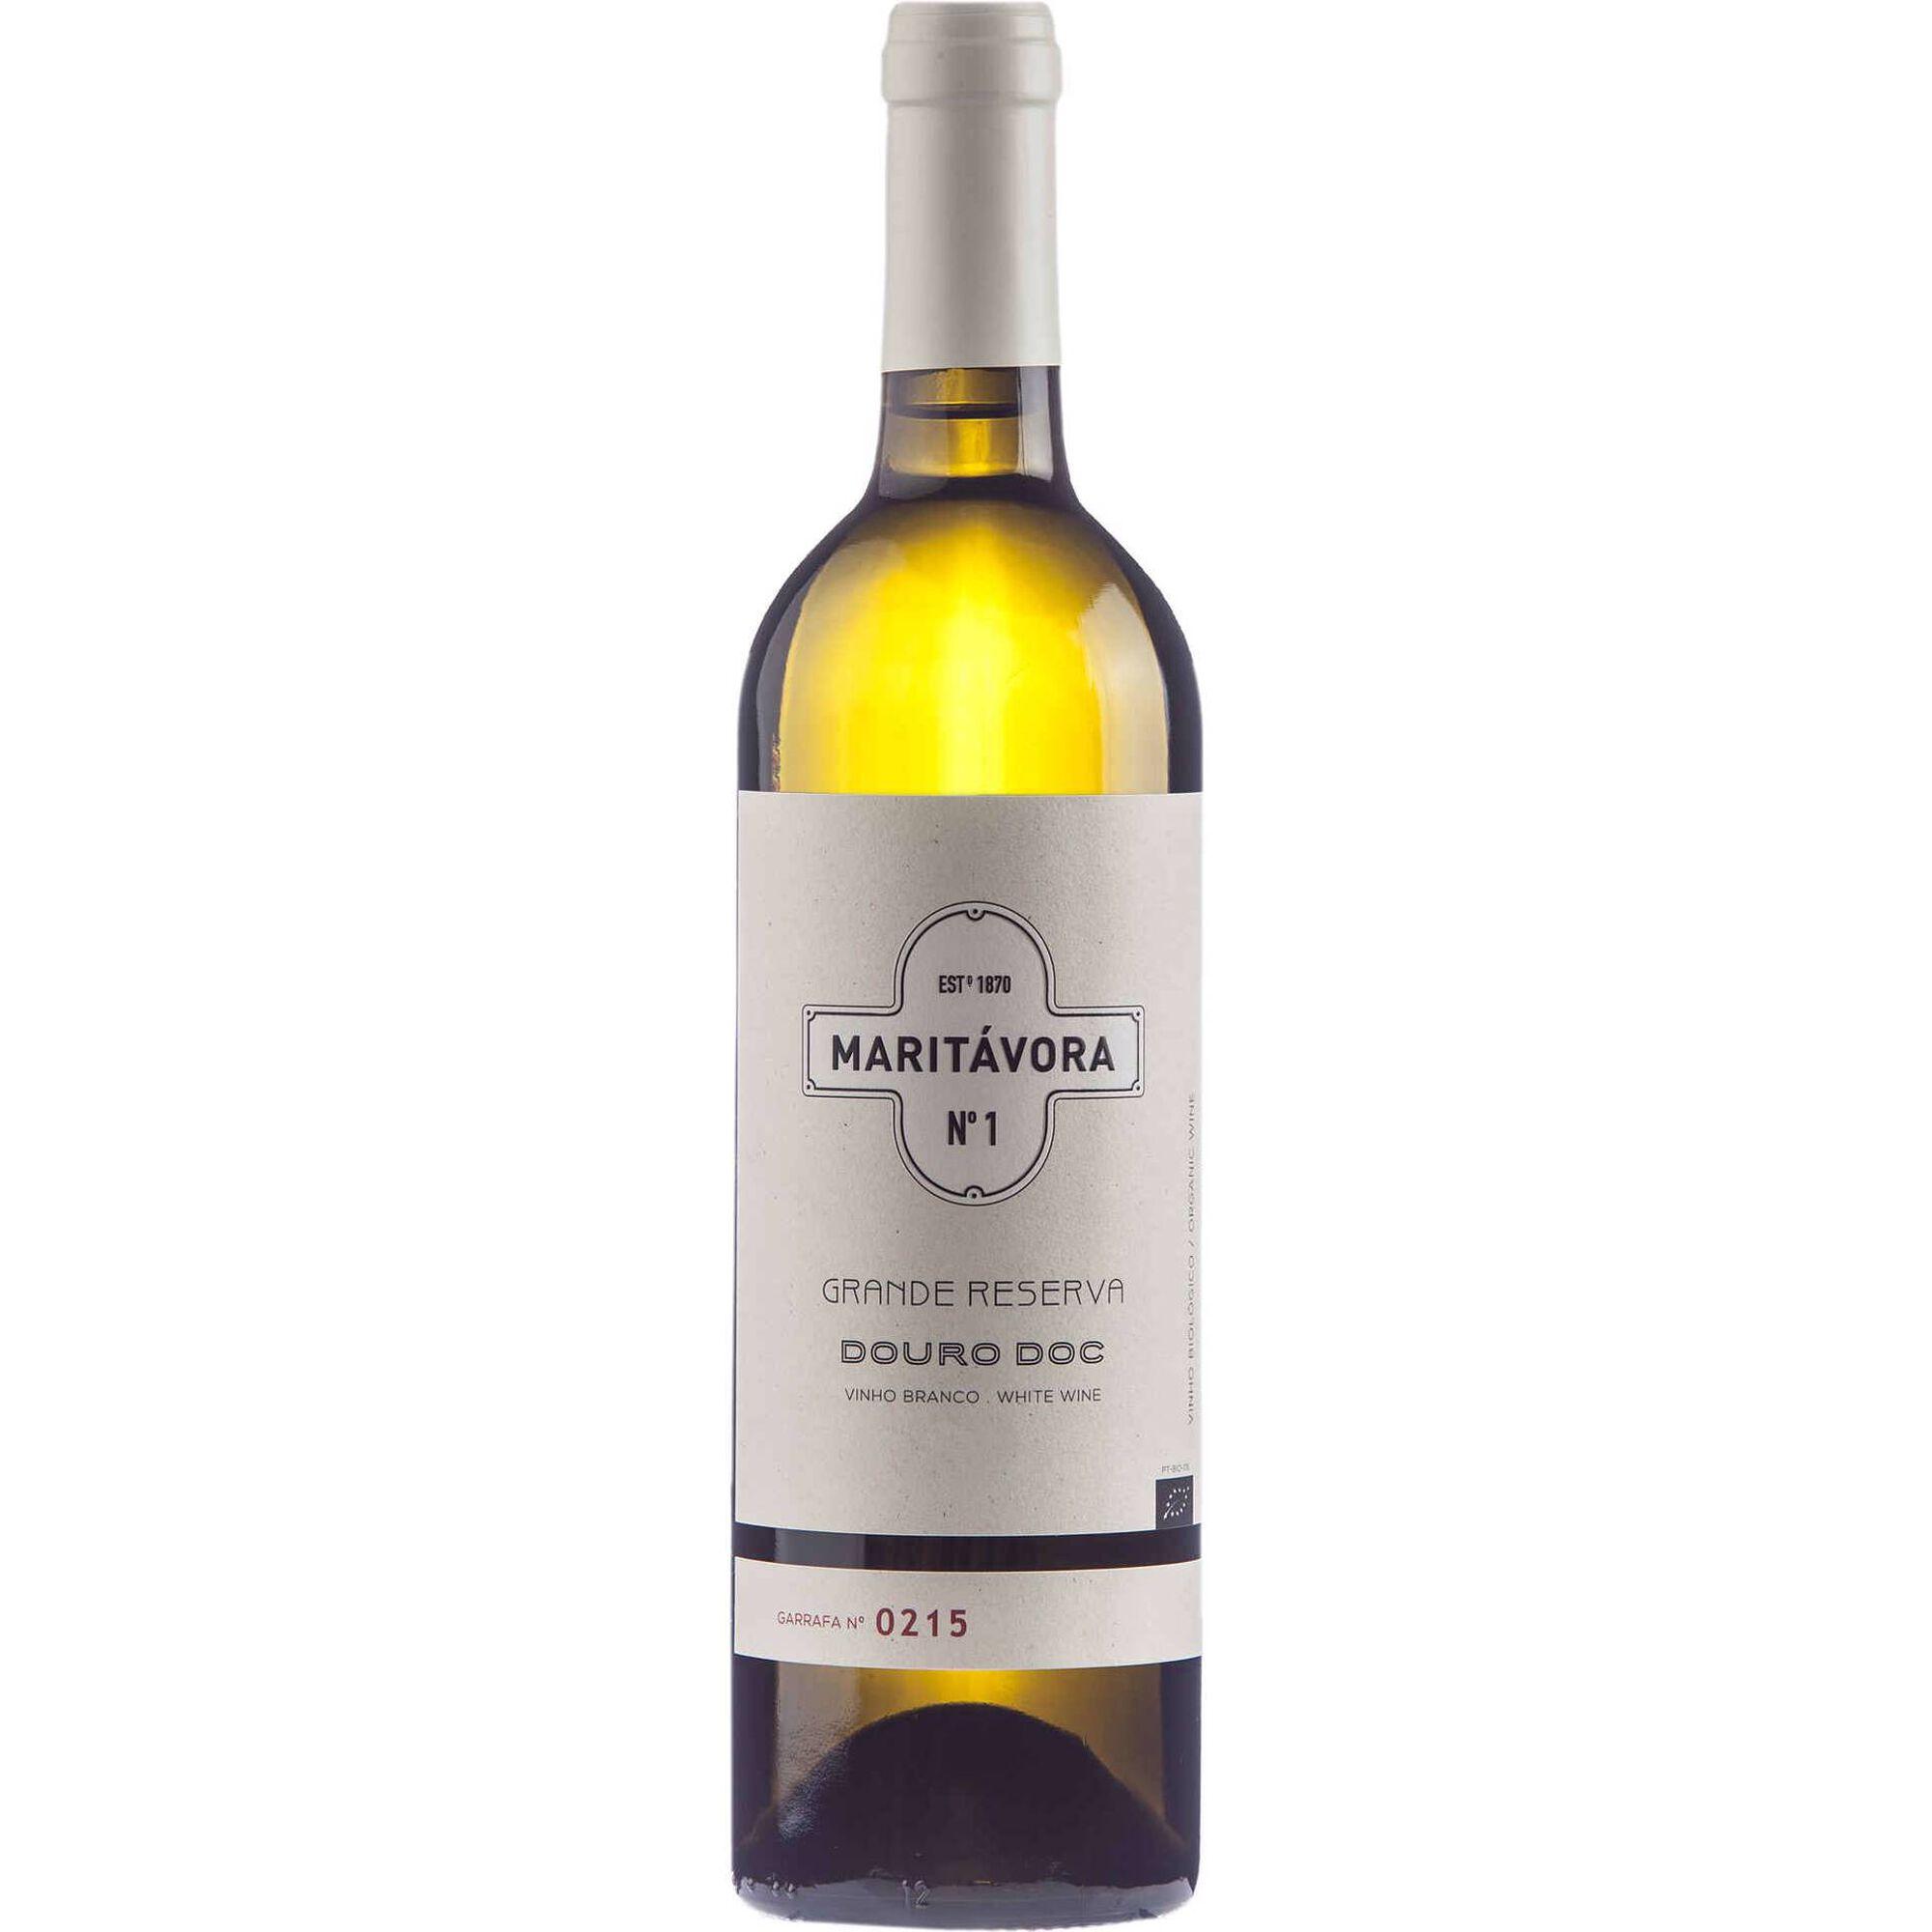 Maritávora Grande Reserva DOC Douro Vinho Branco